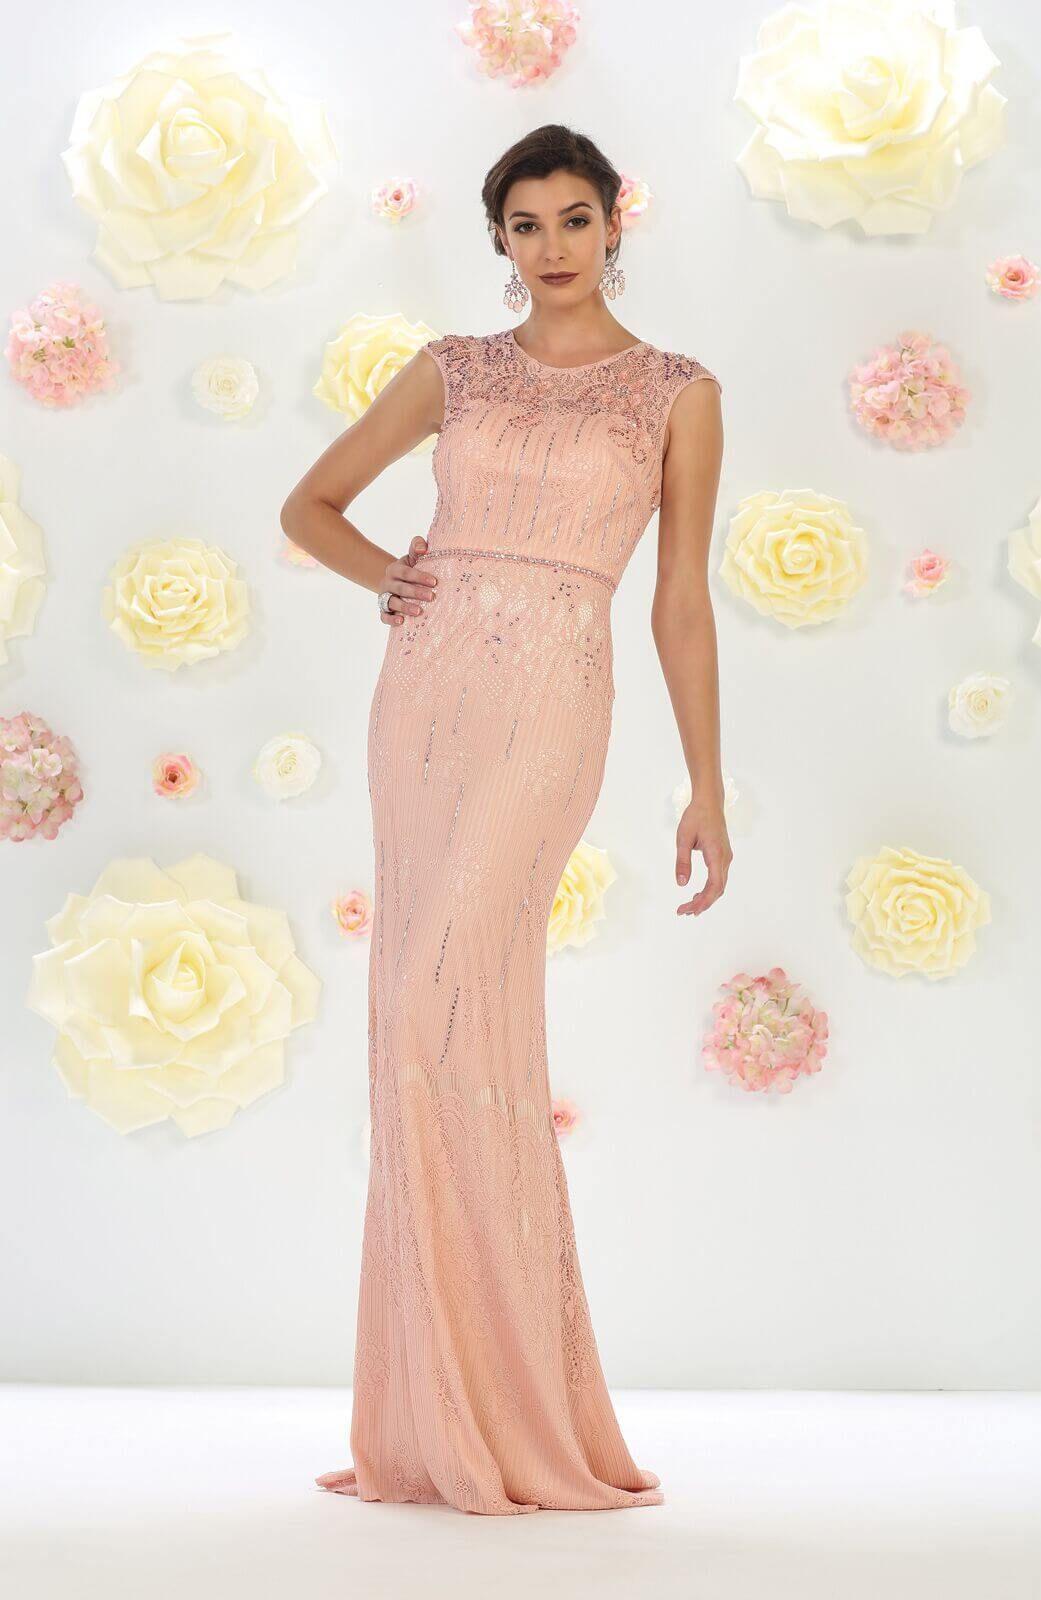 911f8816e Long Formal Plus Size Mother of the Bride Lace Dress   DressOutlet - The  Dress Outlet